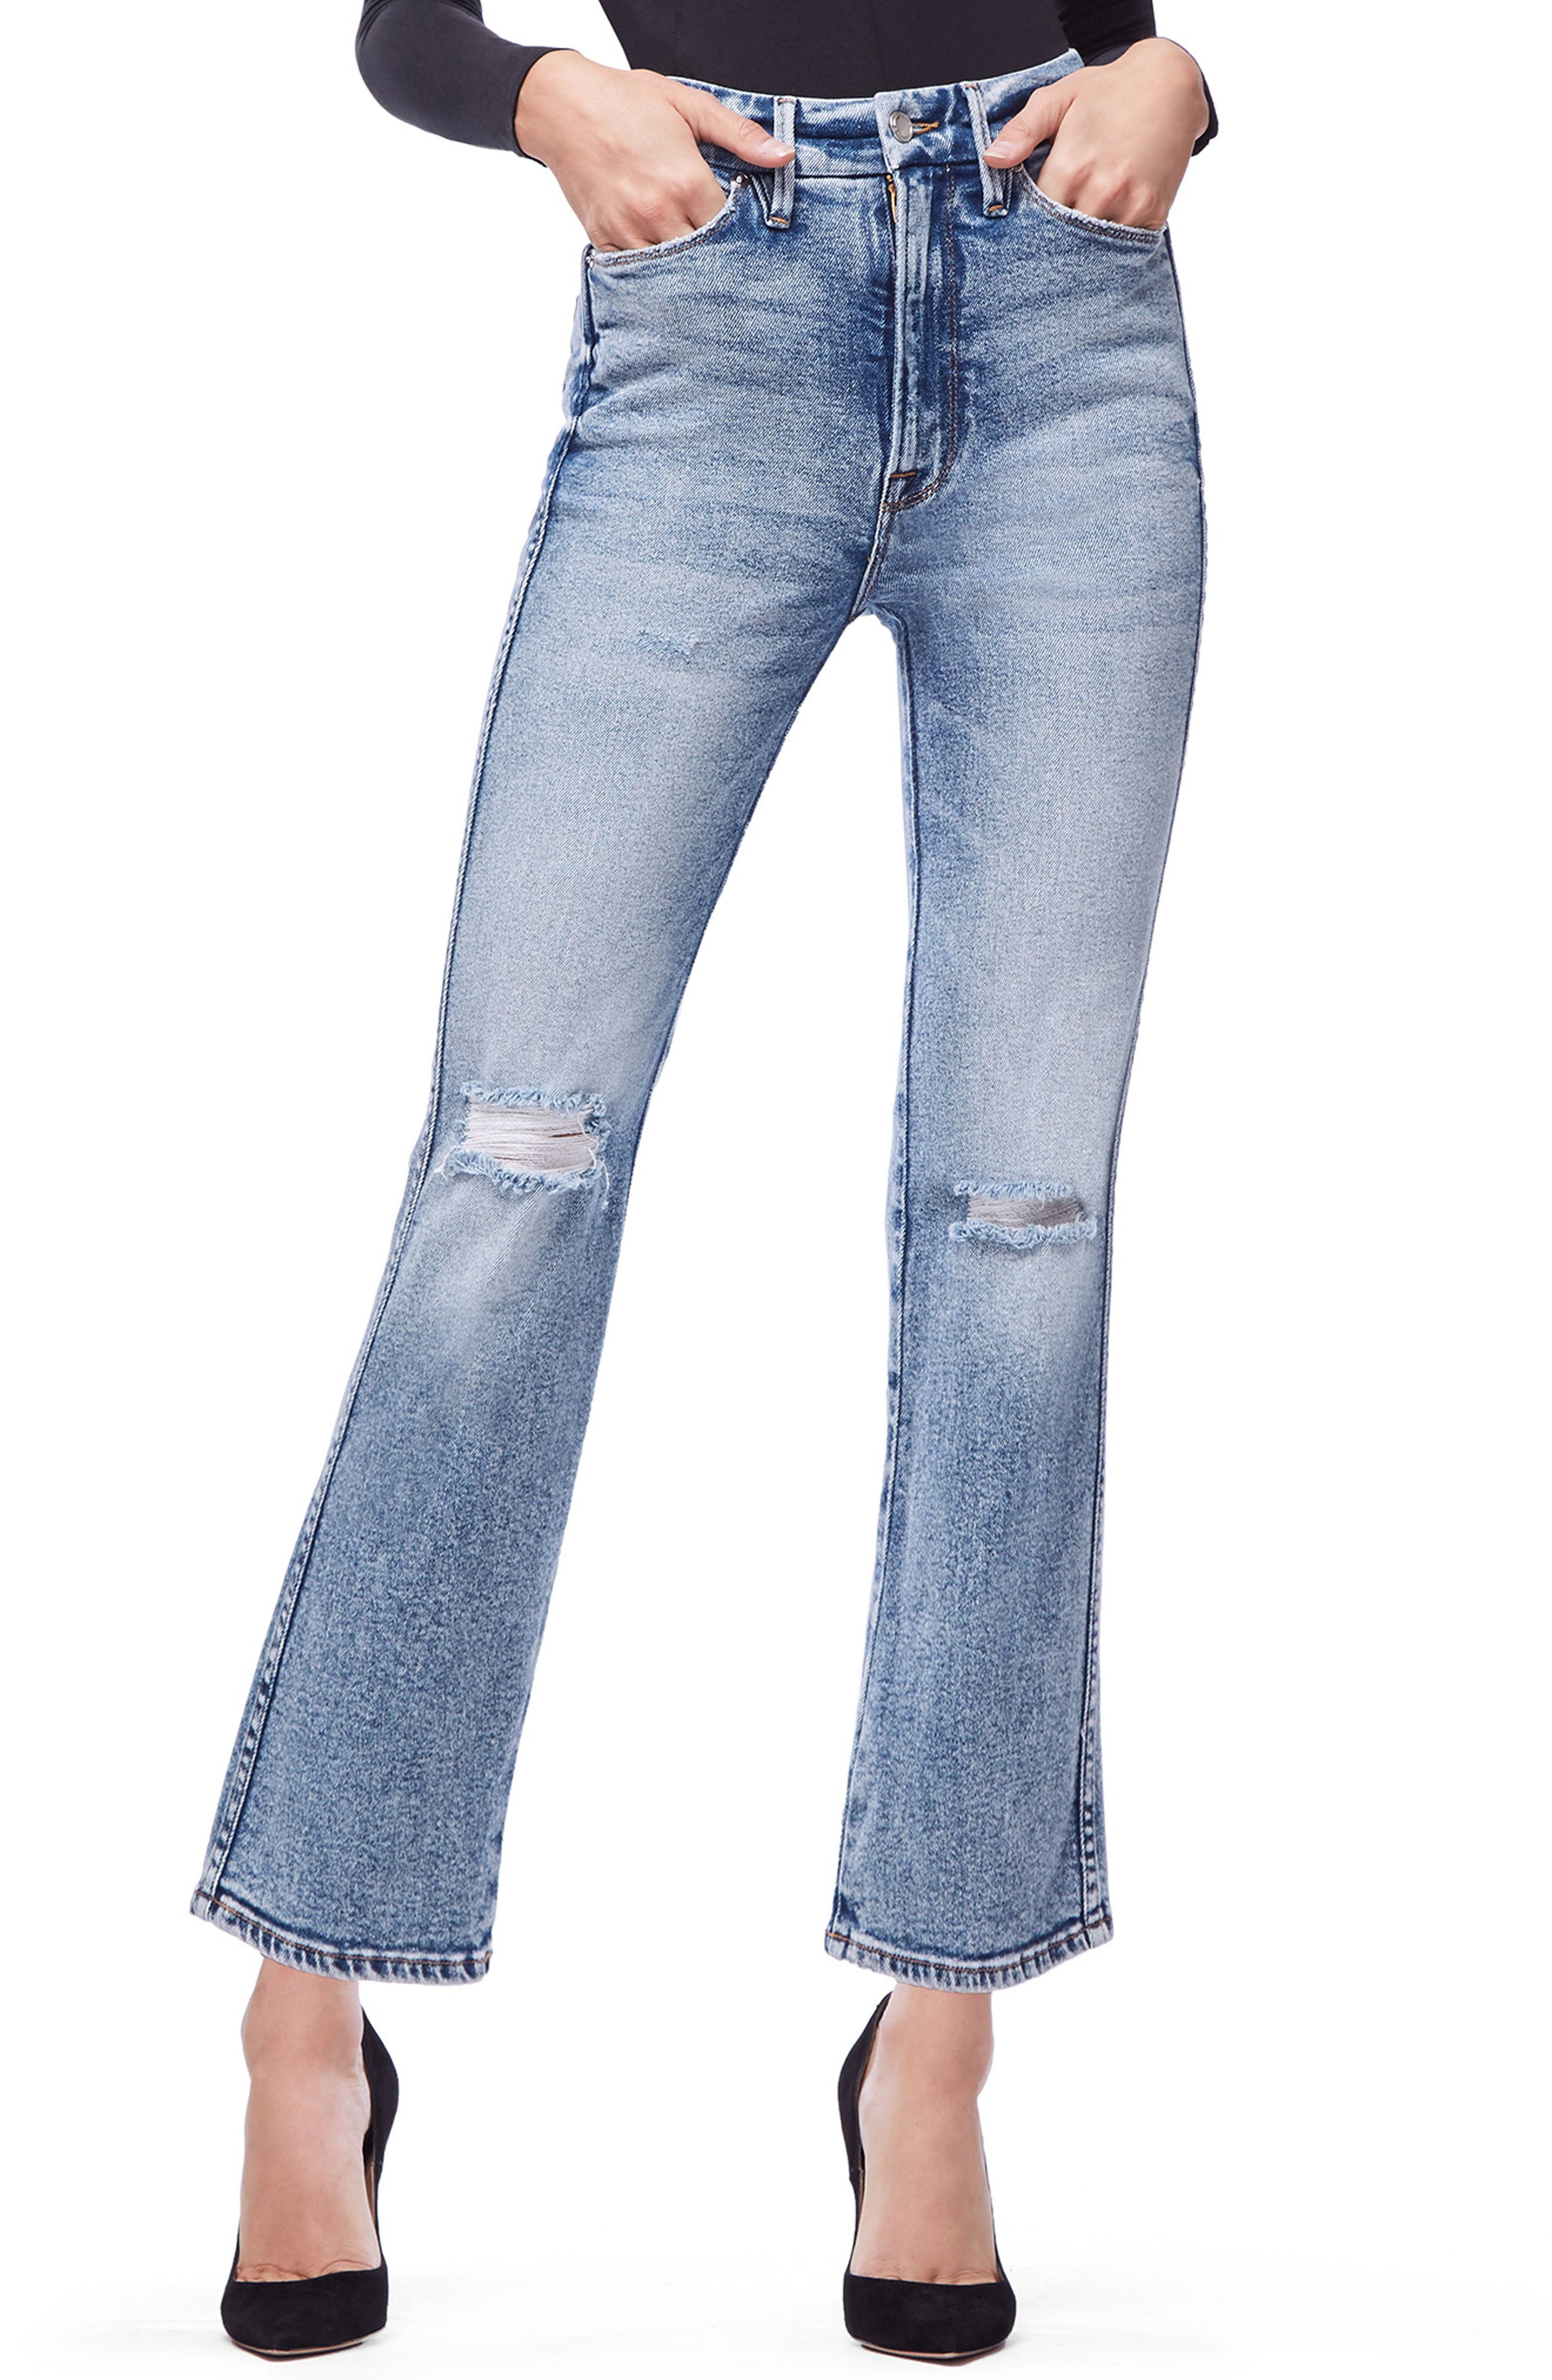 GOOD AMERICAN, Good Curve High Waist Ankle Straight Leg Jeans, Main thumbnail 1, color, 401